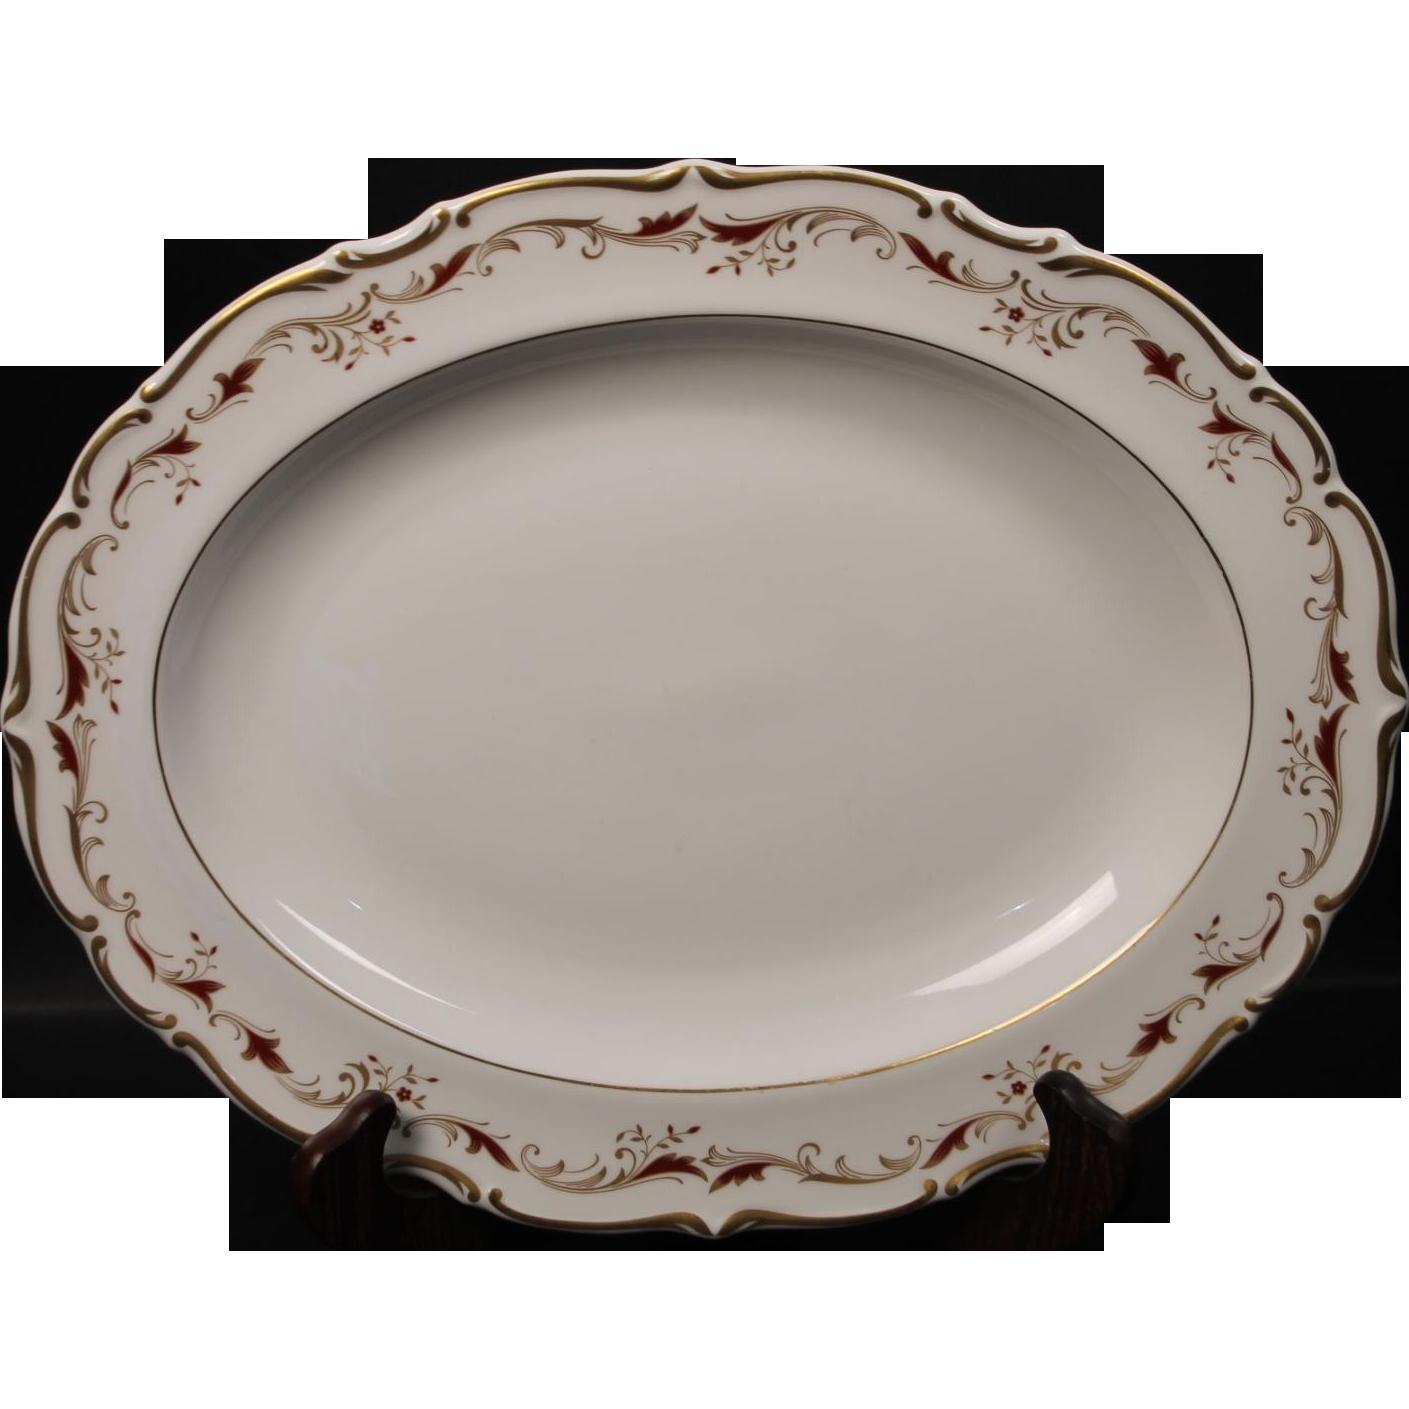 Royal Doulton Bone China Oval Serving Platter in the Strasbourg Pattern.  Measures 13 5/8''.